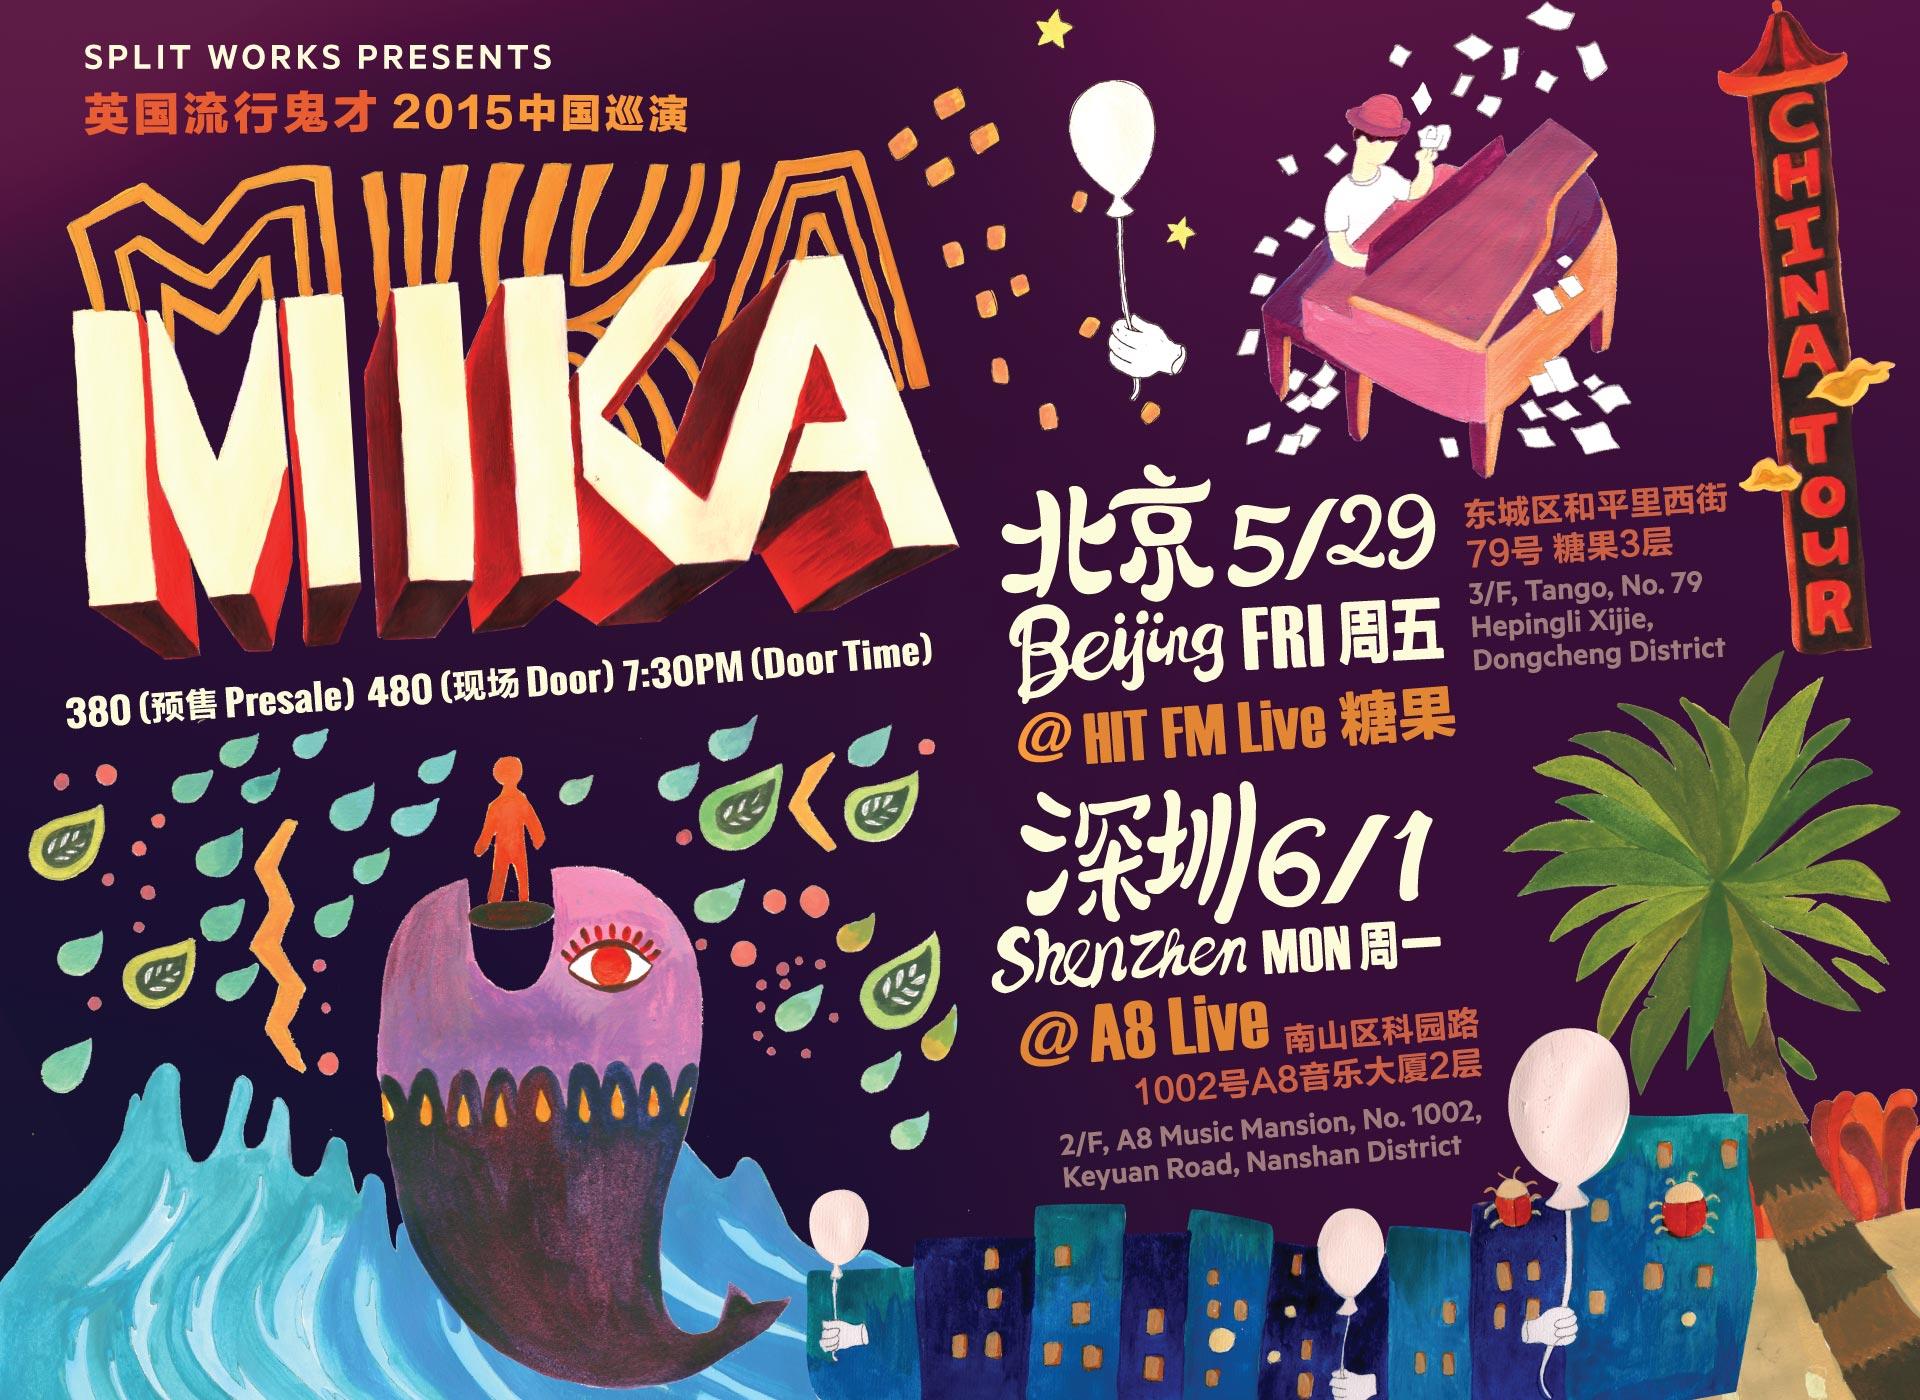 Horizontal-Mika-Poster